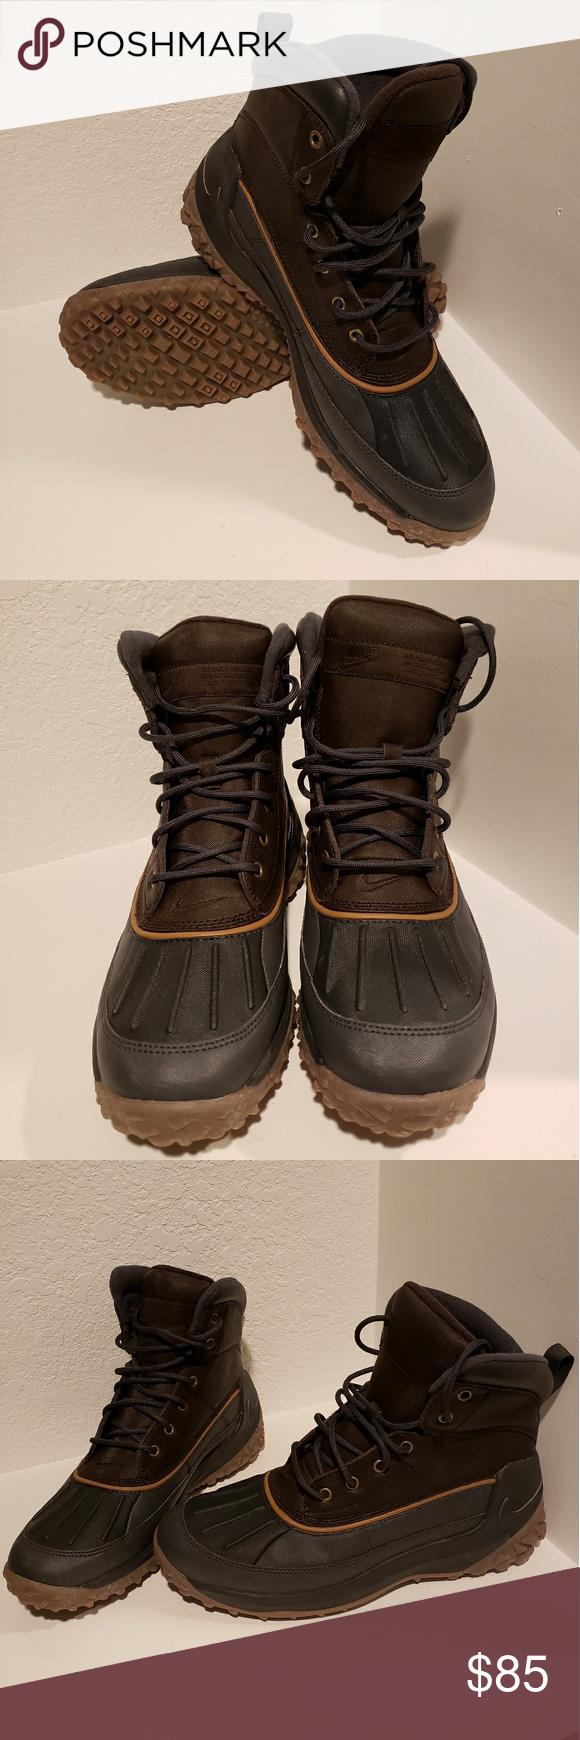 7a92dc00bf2 Nike Kynwood Boot Anthracite/Dark Gold Leaf sz 8.5 Nike Kynwood Boot ...